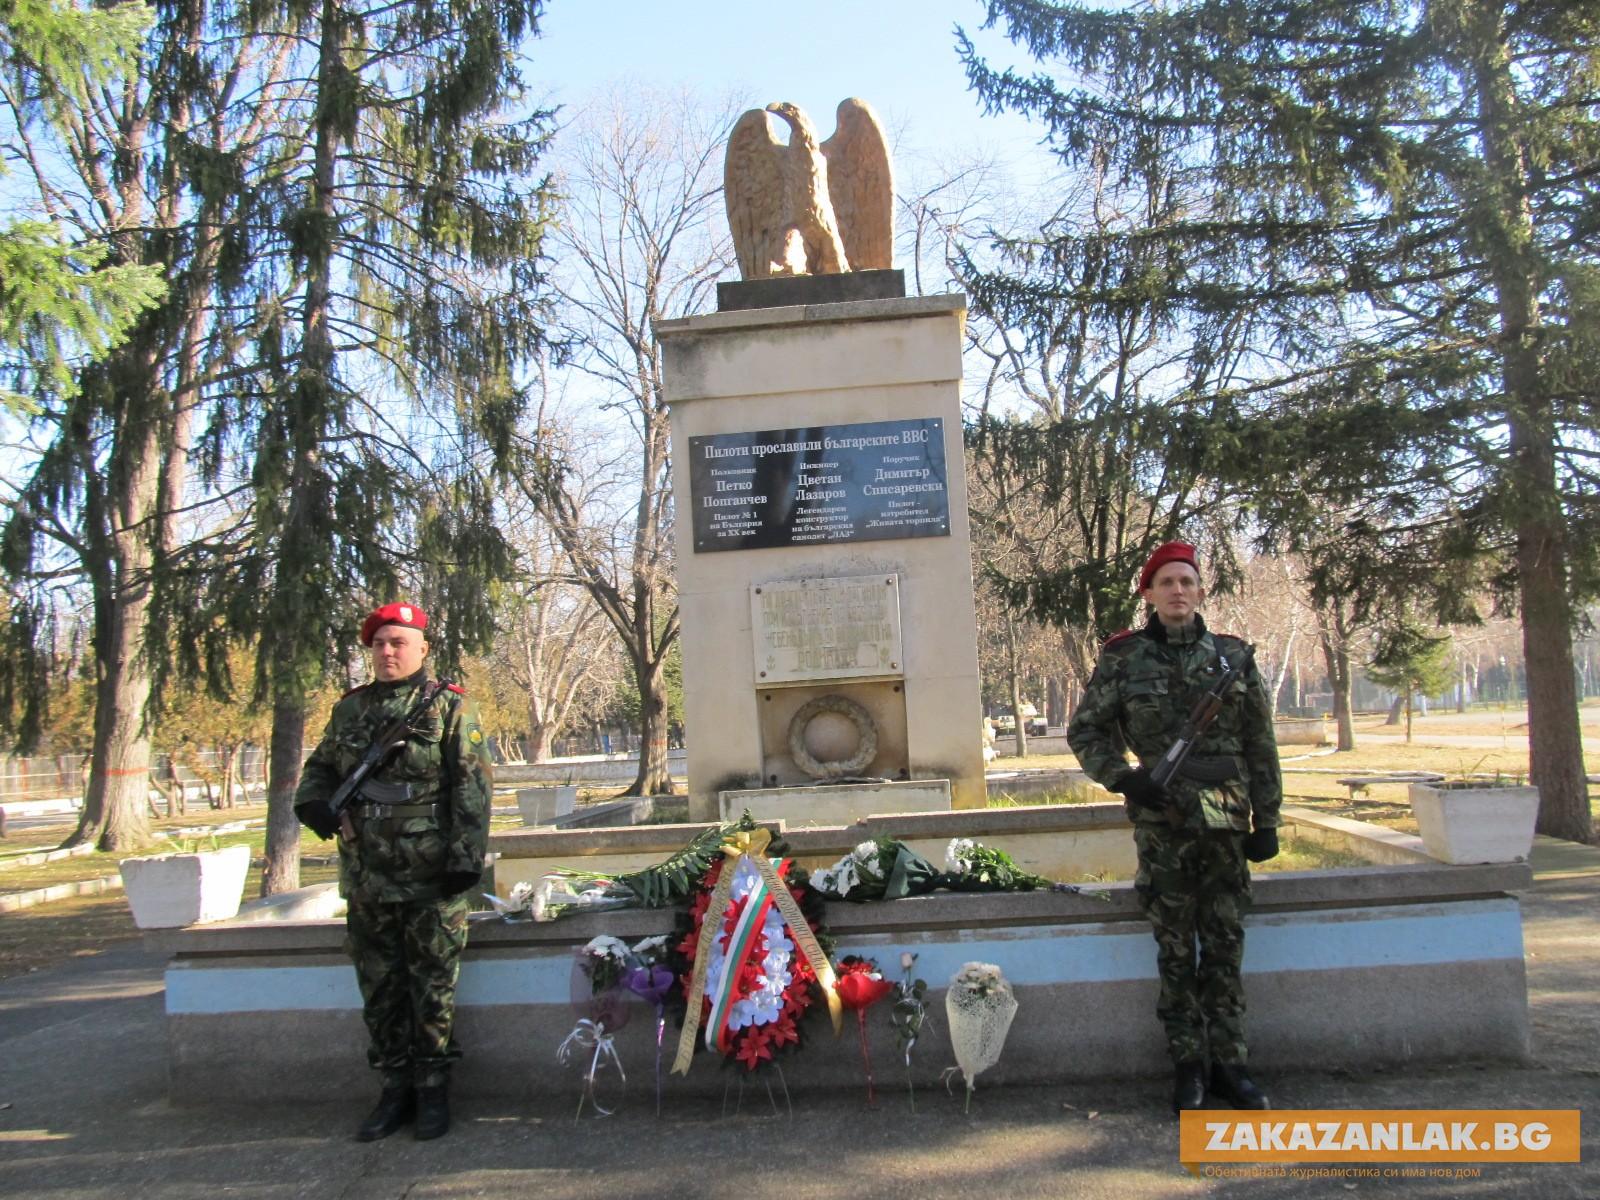 Поручик Списаревски е като Ботев и Левски, но в друго технологично време